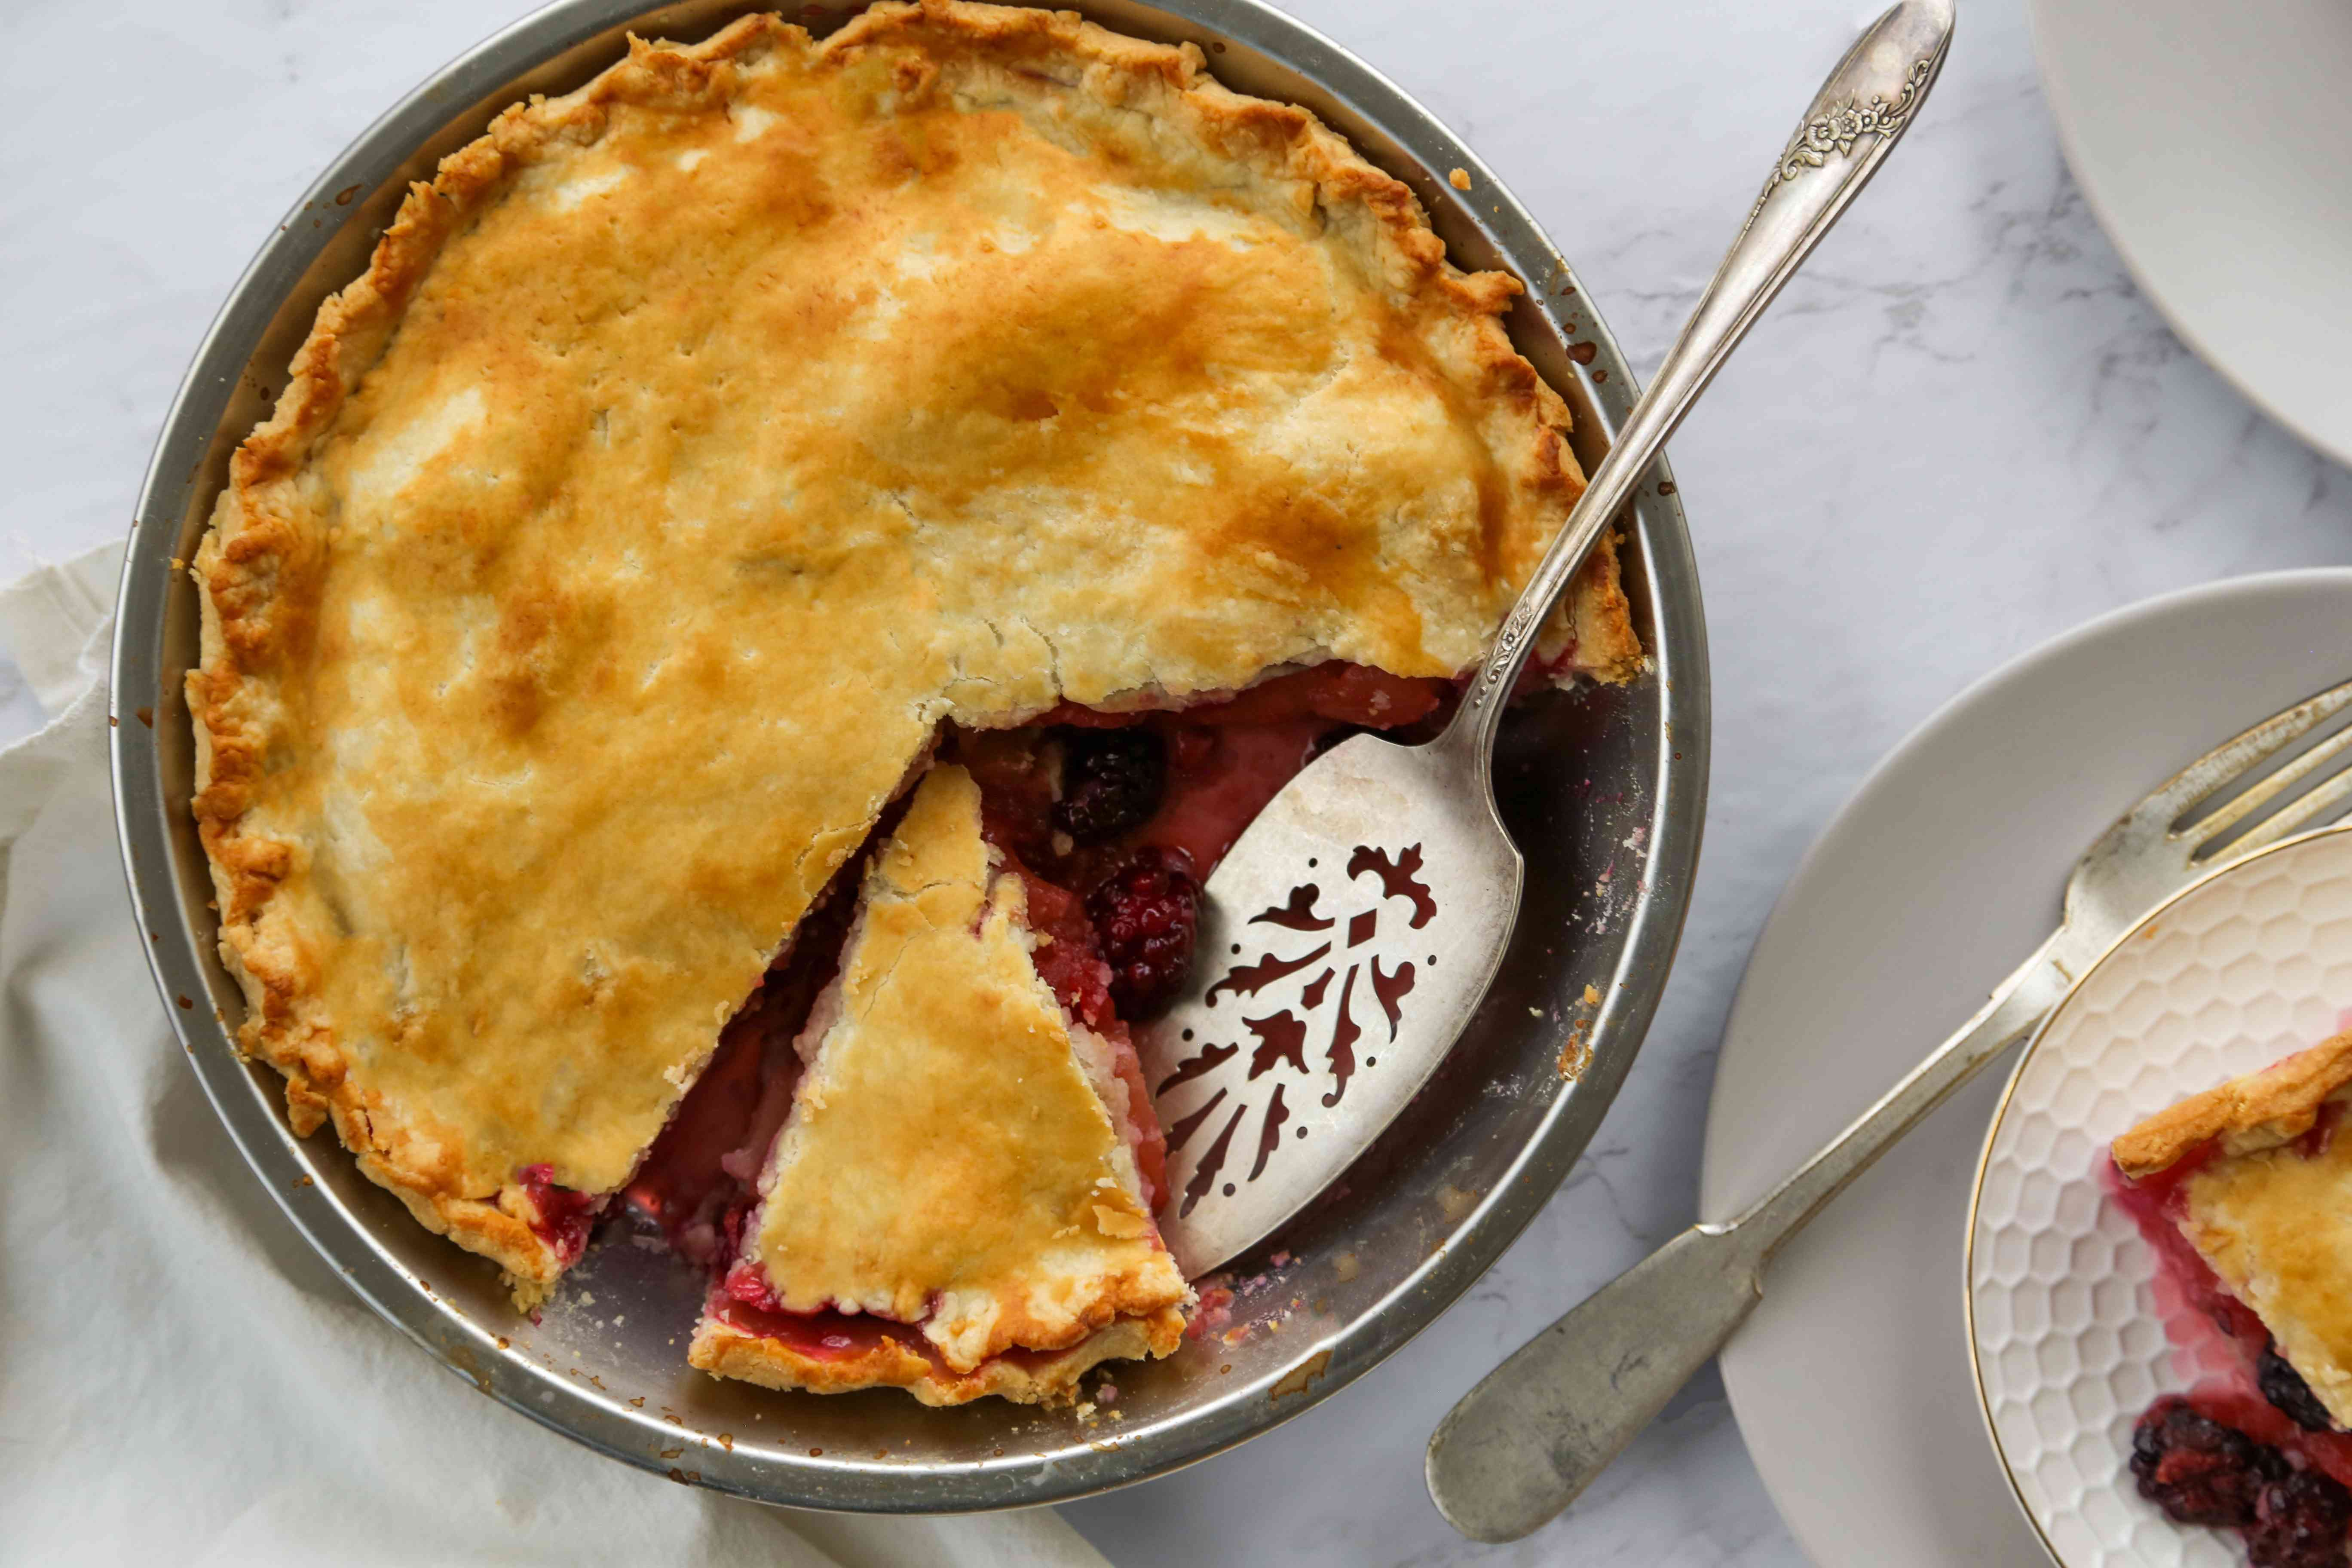 British apple and blackberry pie